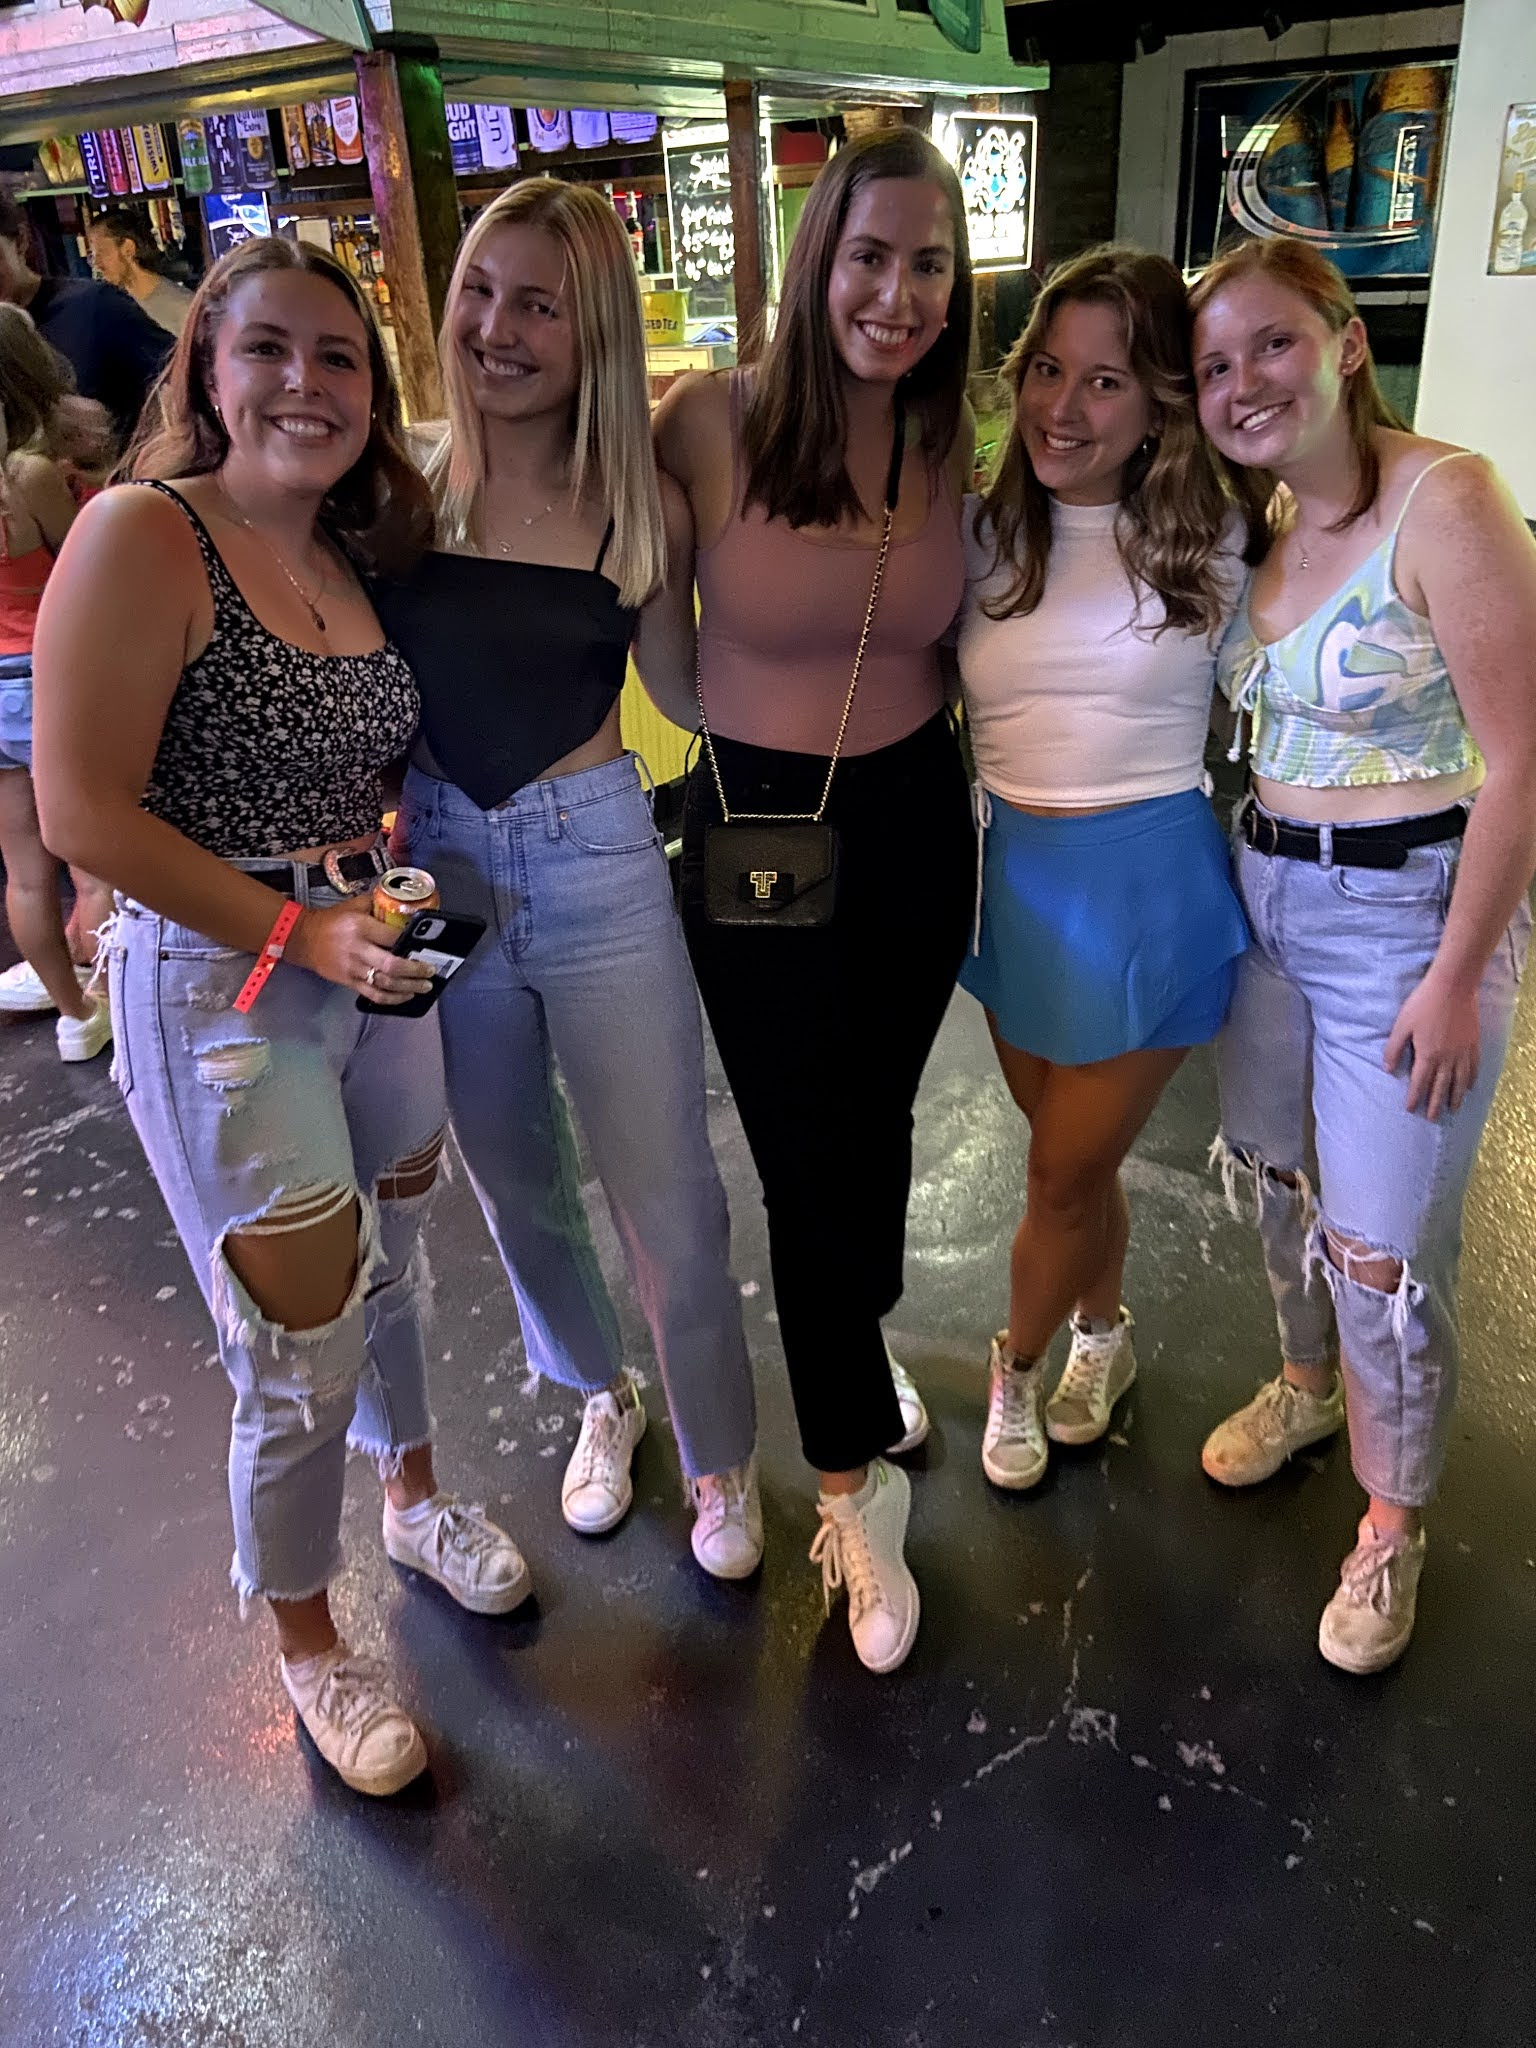 college bar, college, wake forest, winston salem